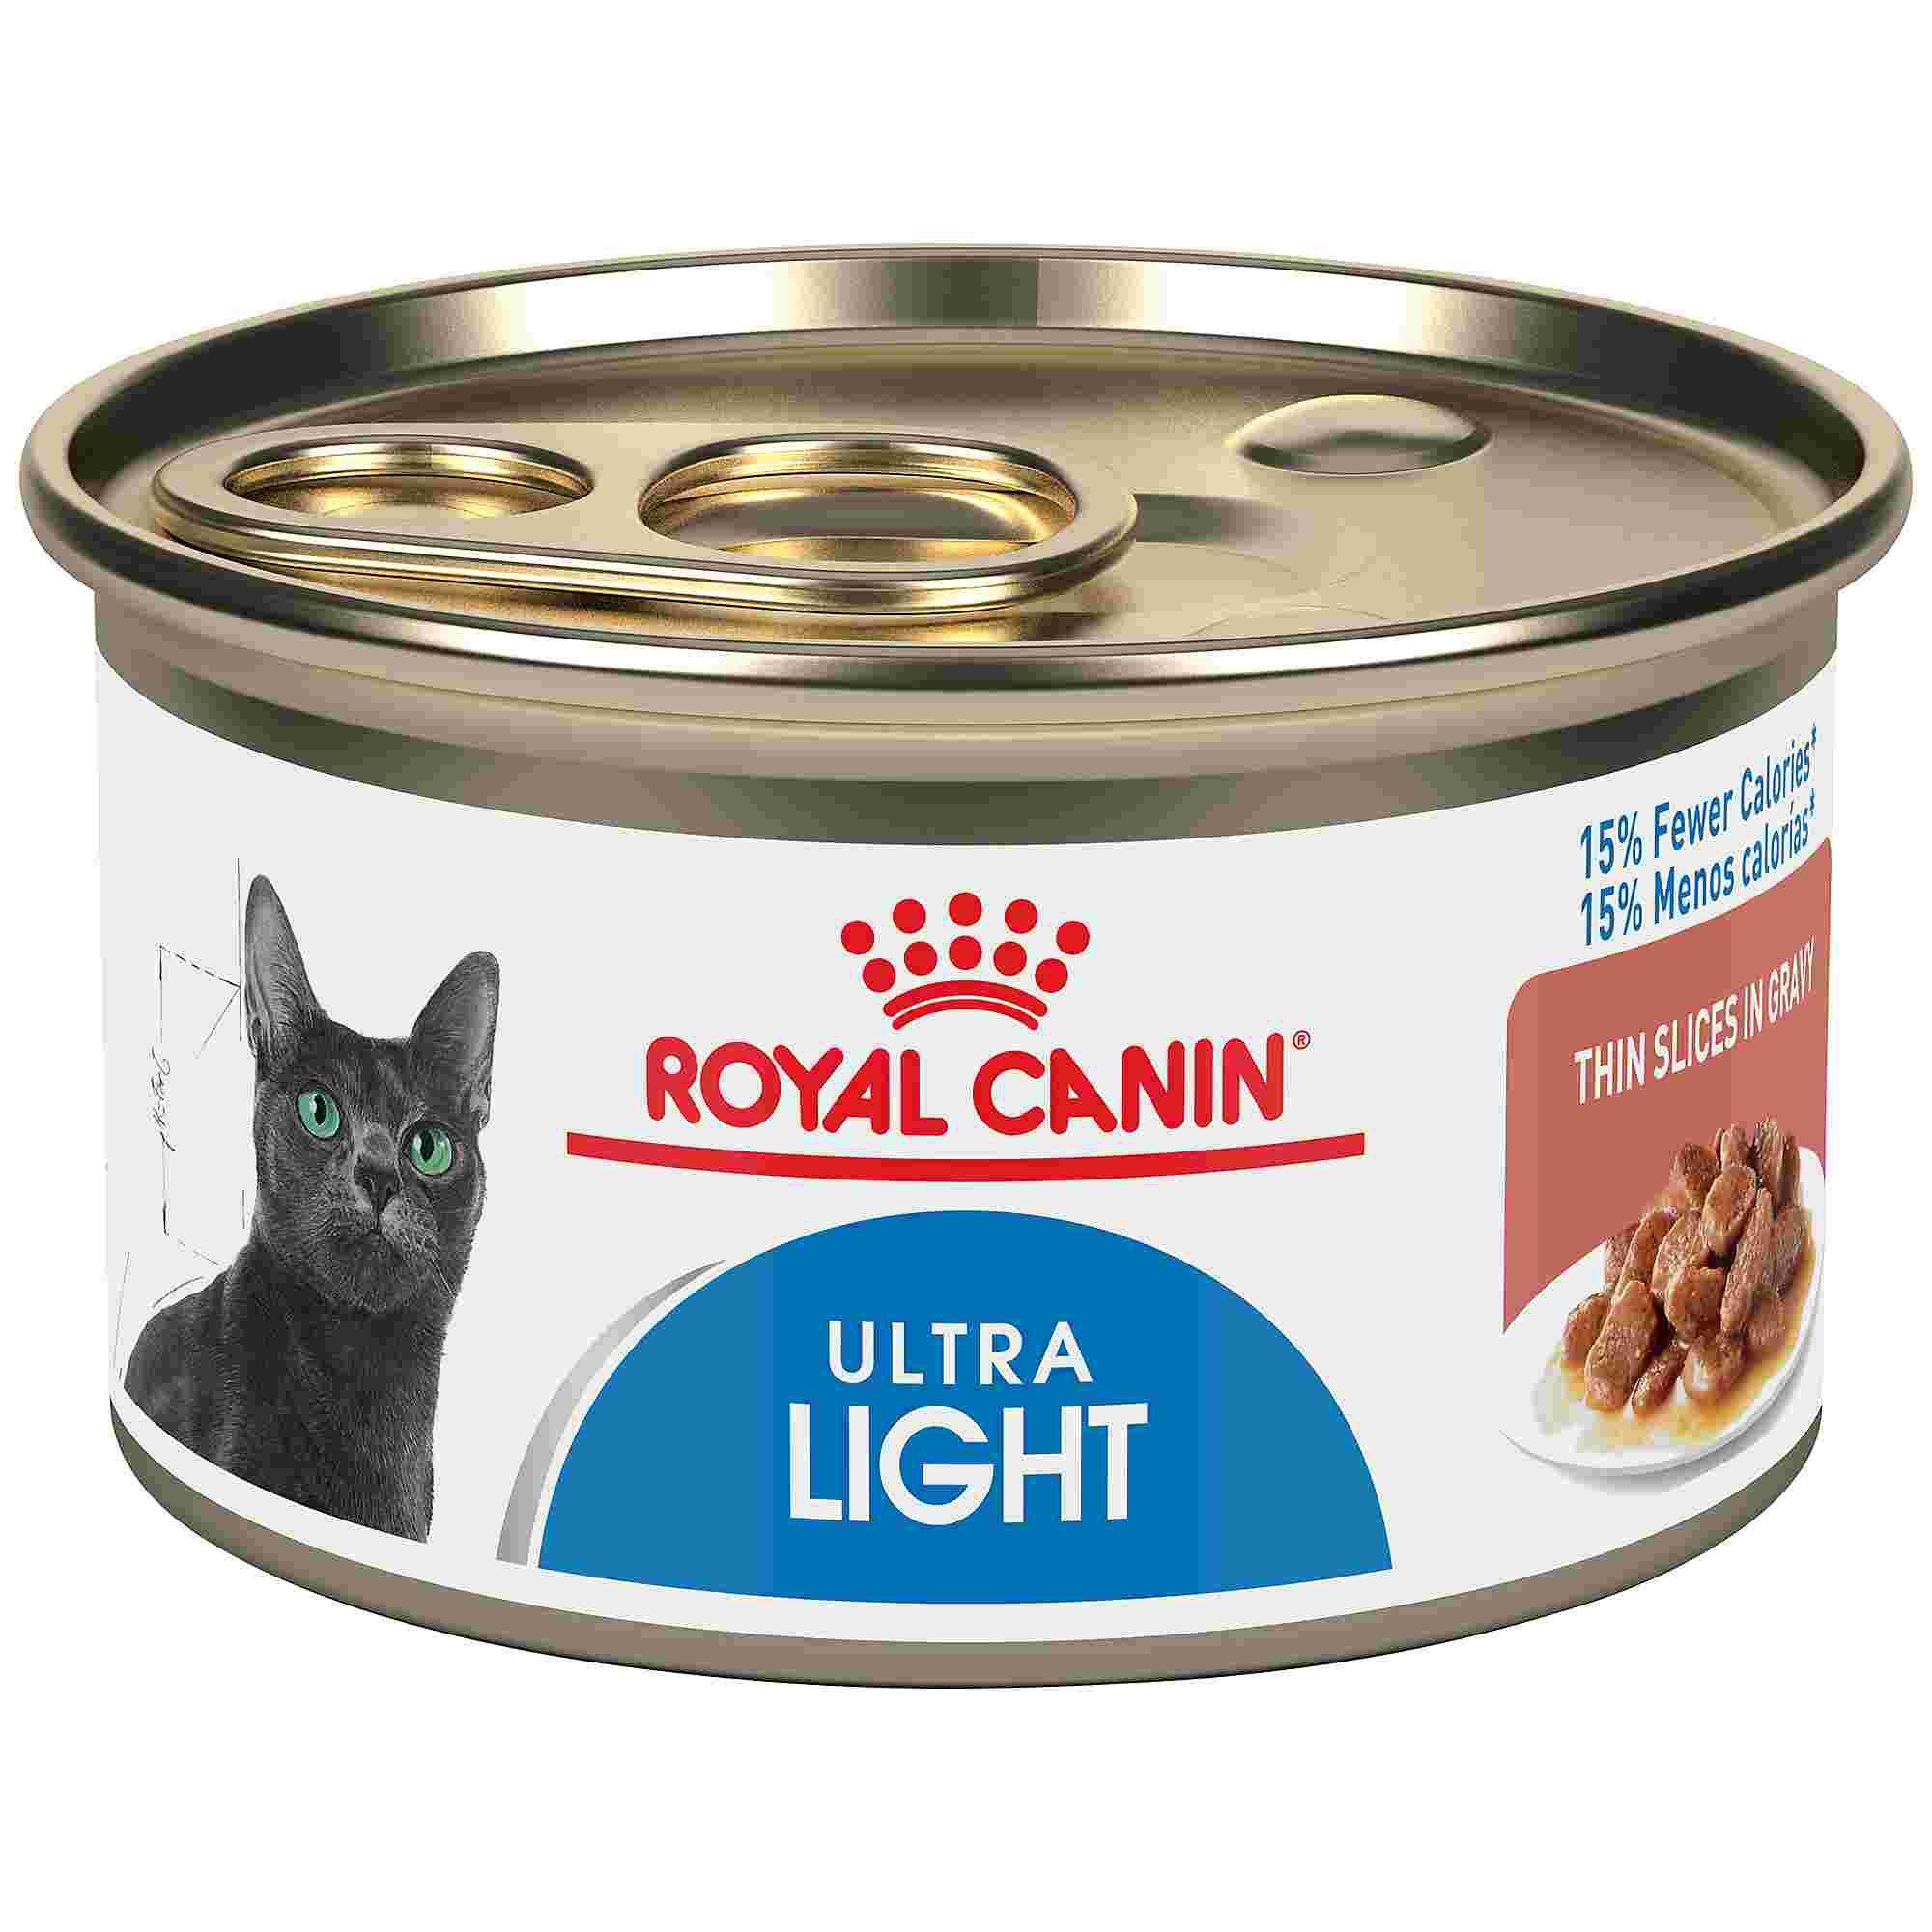 Royal Canin Feline Health Nutrition Ultra Light Adult Canned Cat Food